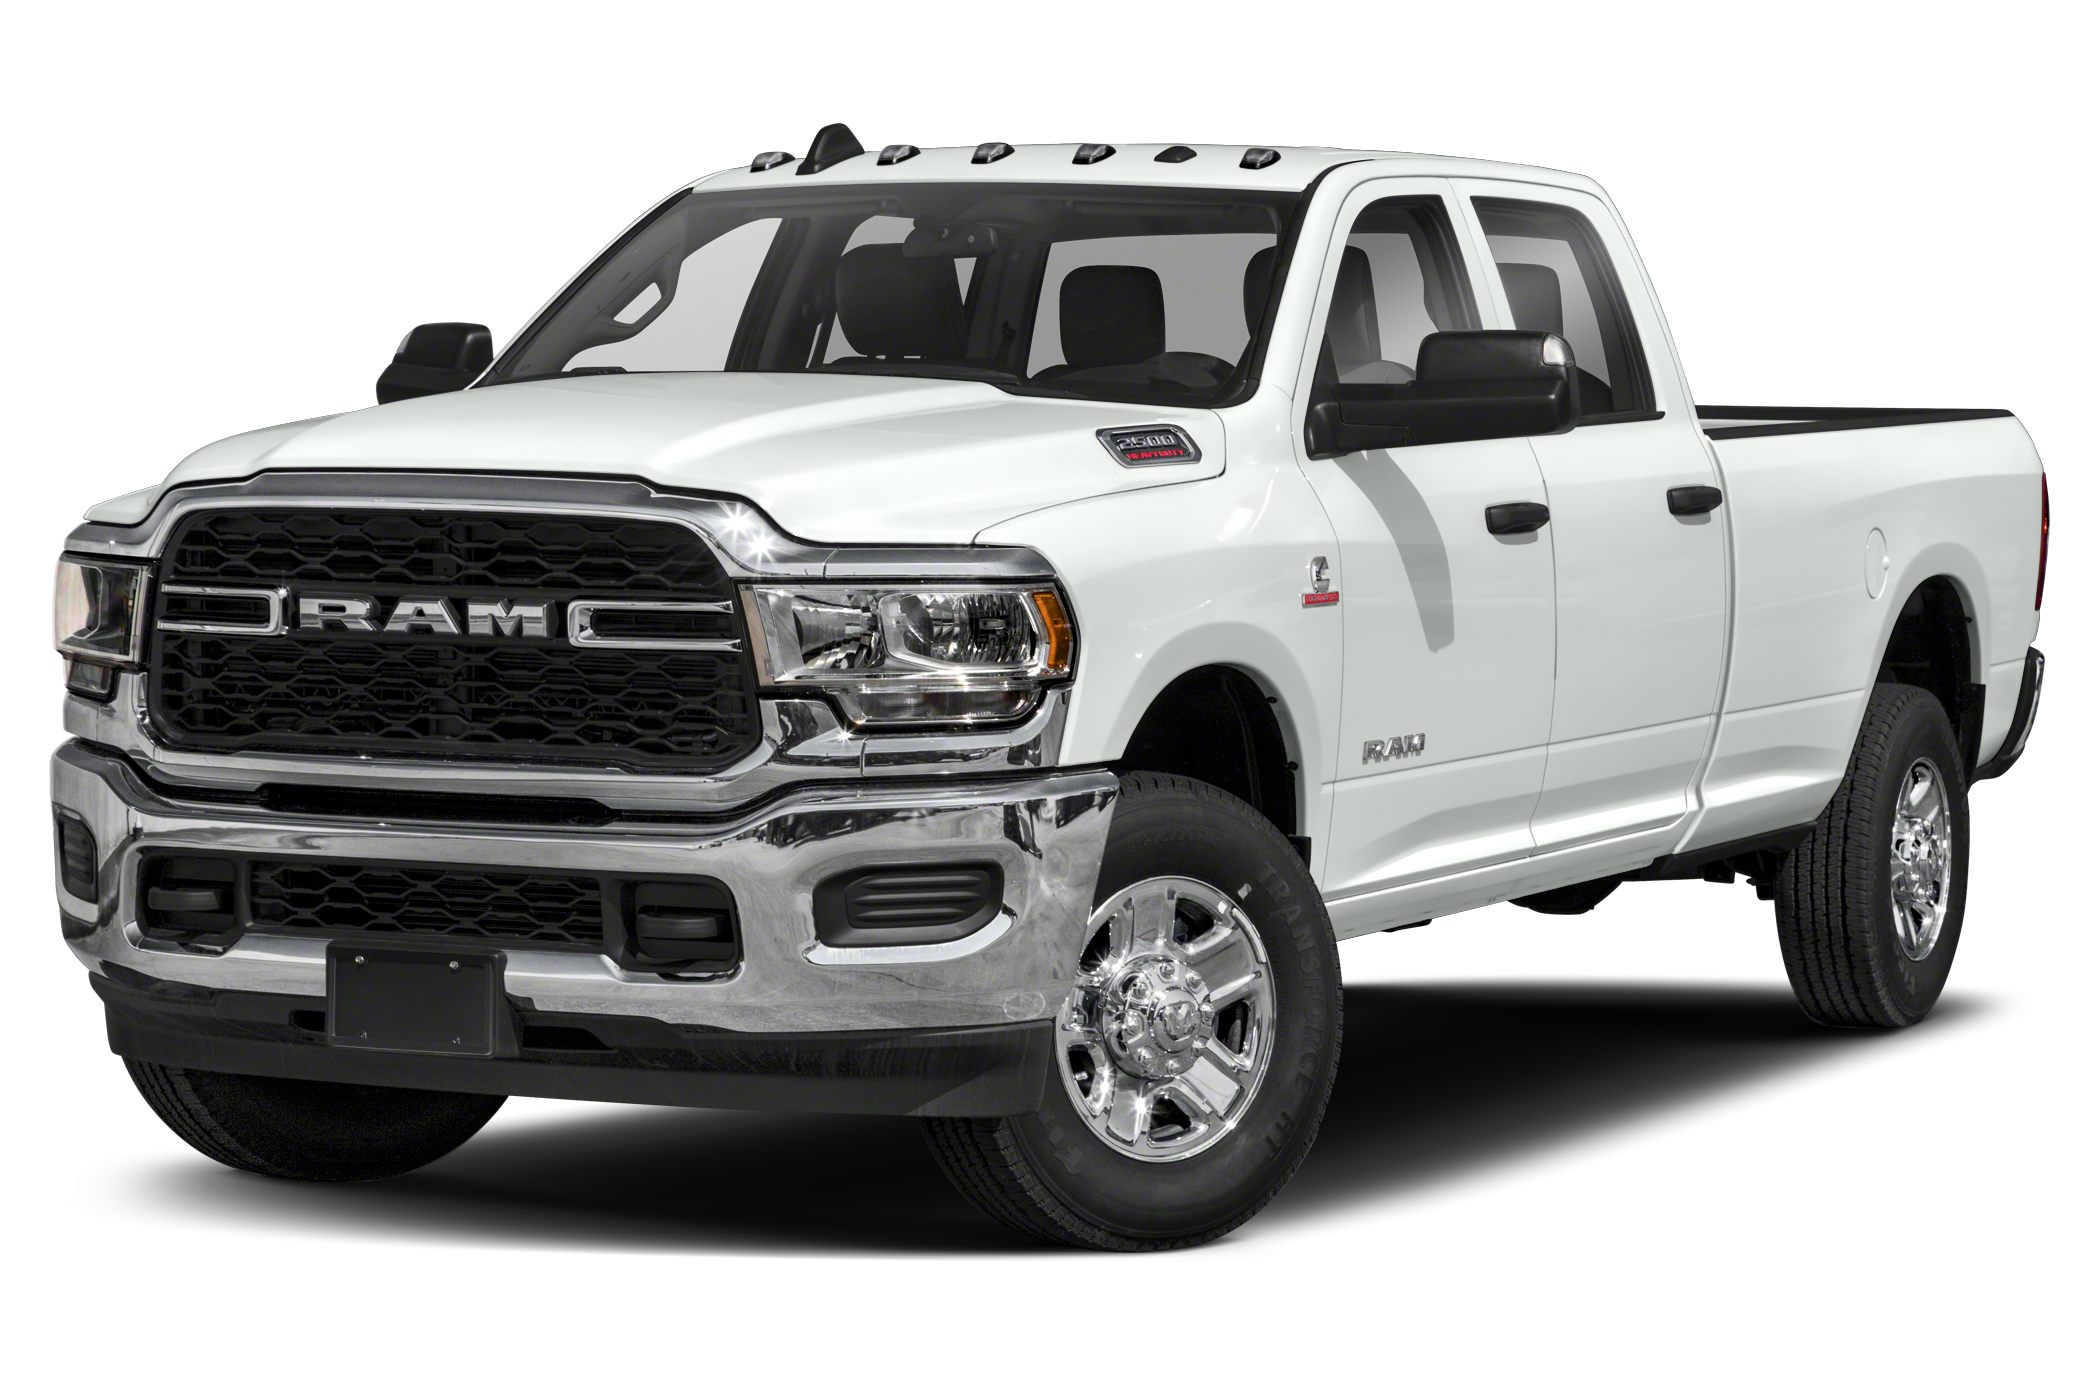 2019 RAM 2500 Big Horn 4x4 Crew Cab 169 in. WB